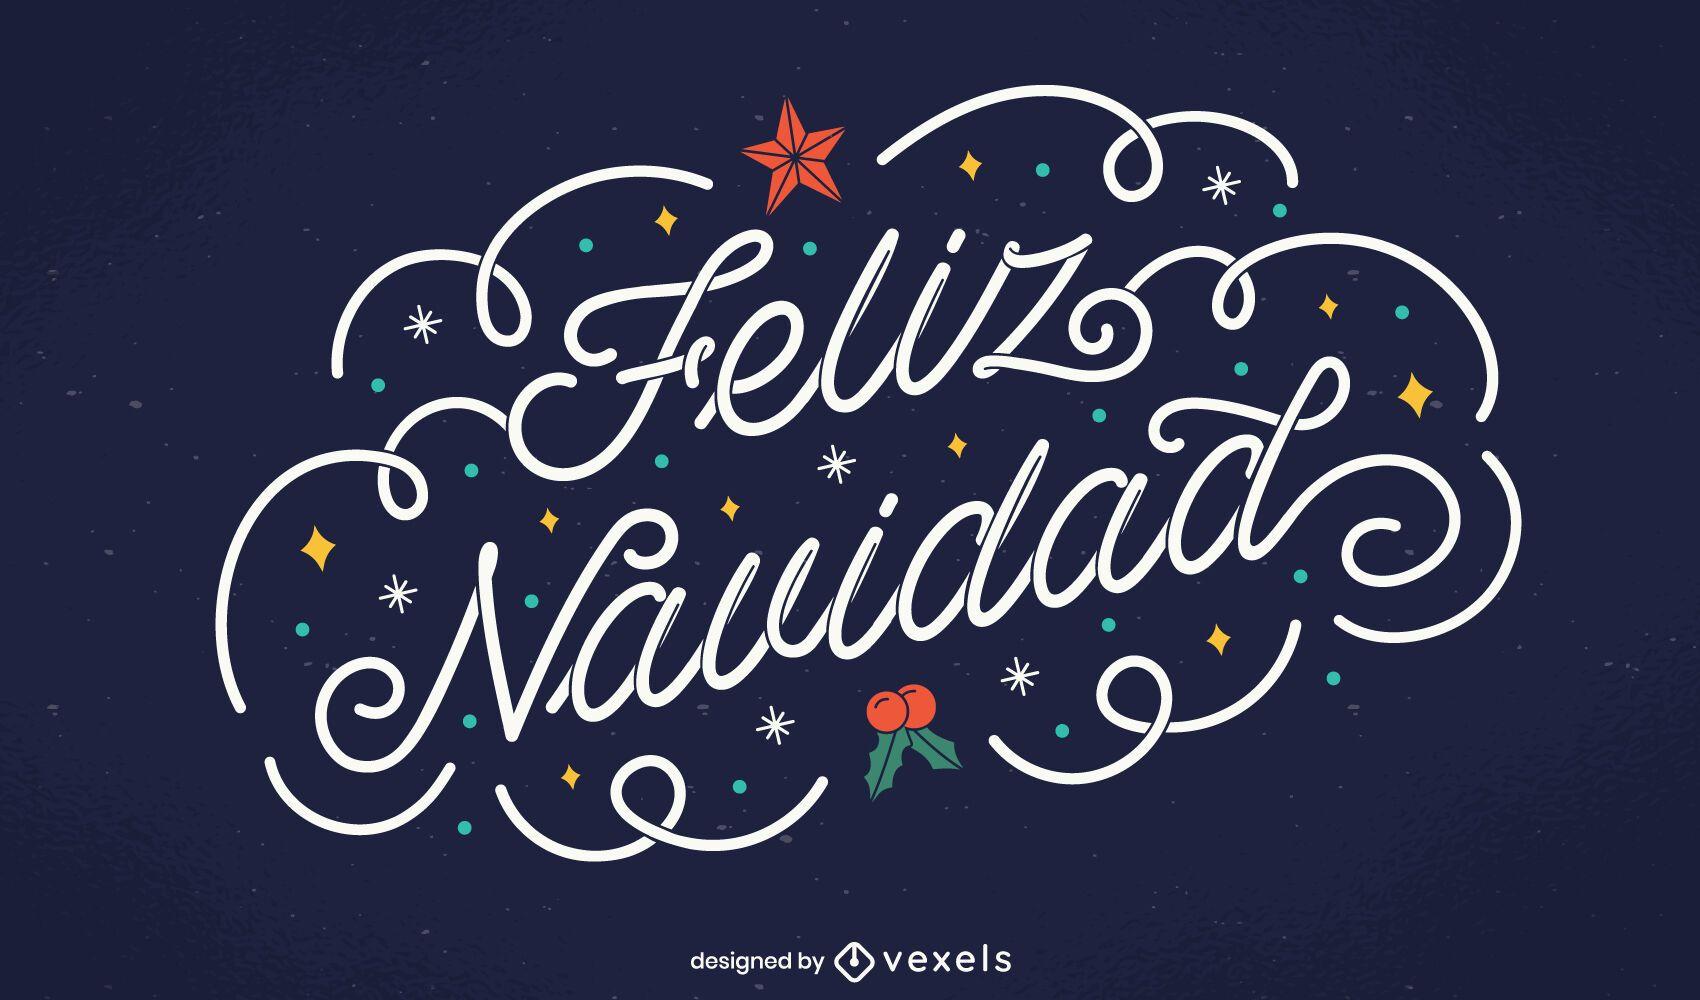 Feliz Navidad Lettering Design